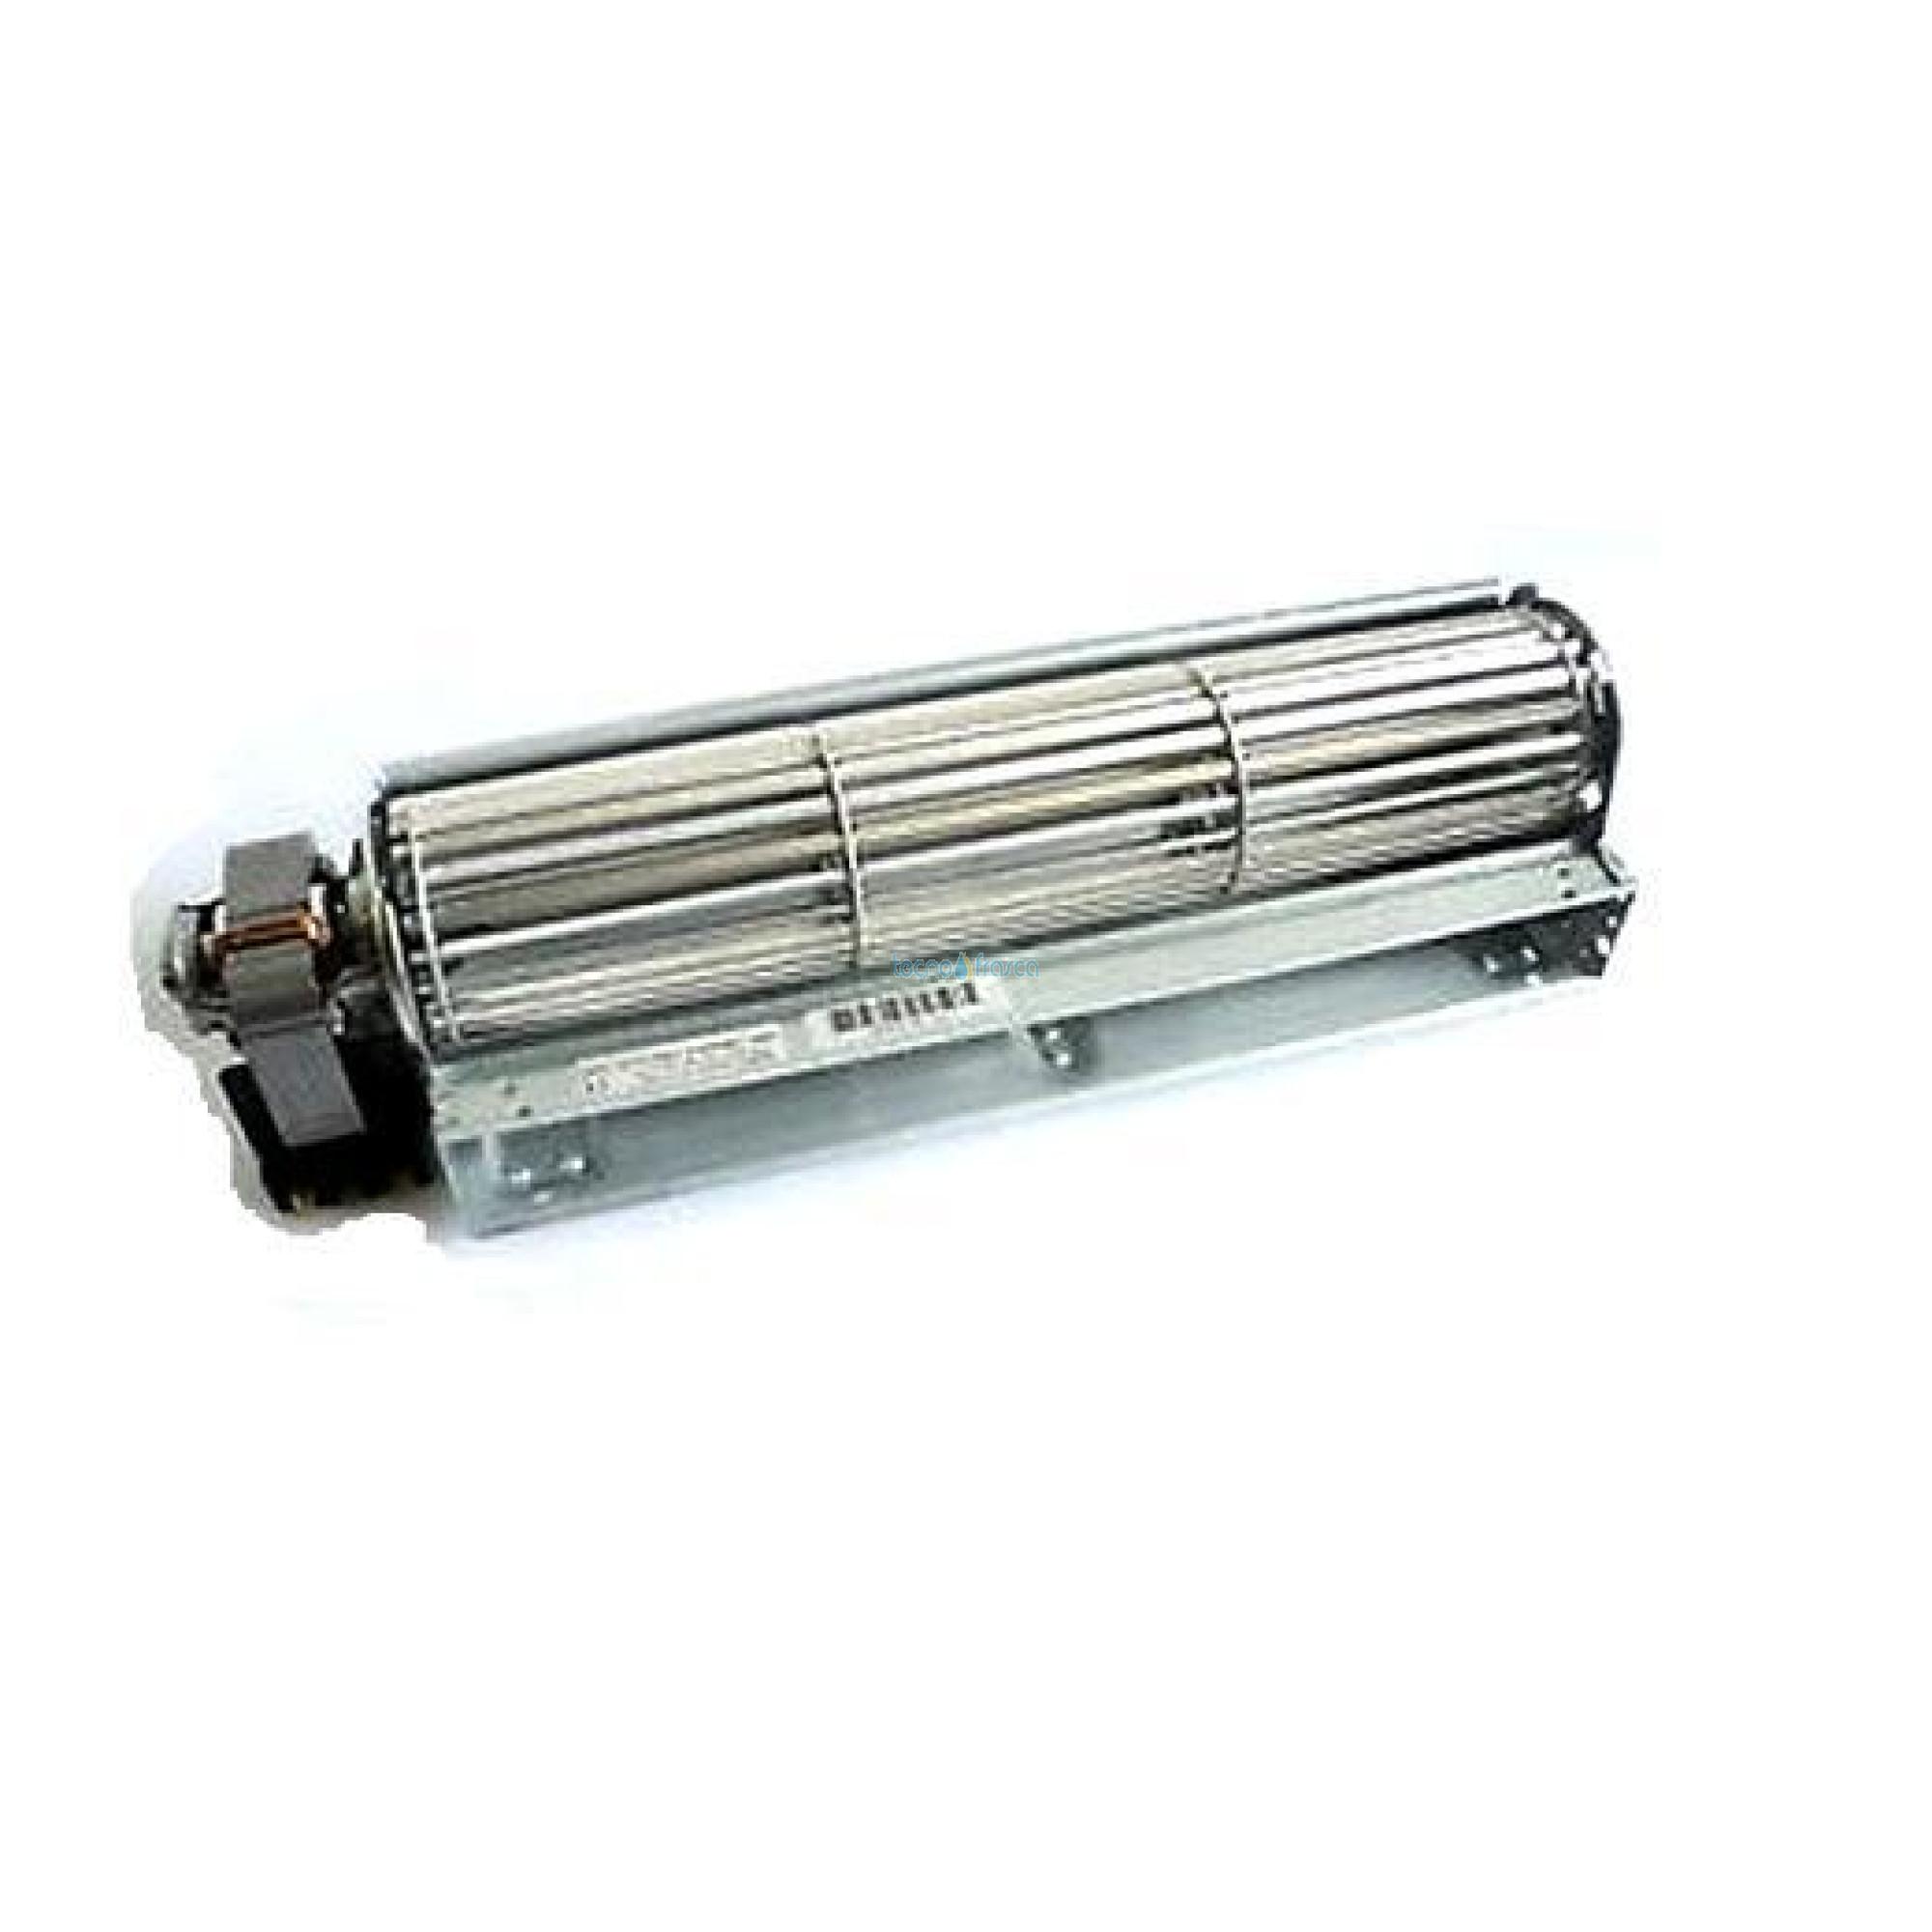 Fondital ventilatore tg360 2 velocita 6y41146500